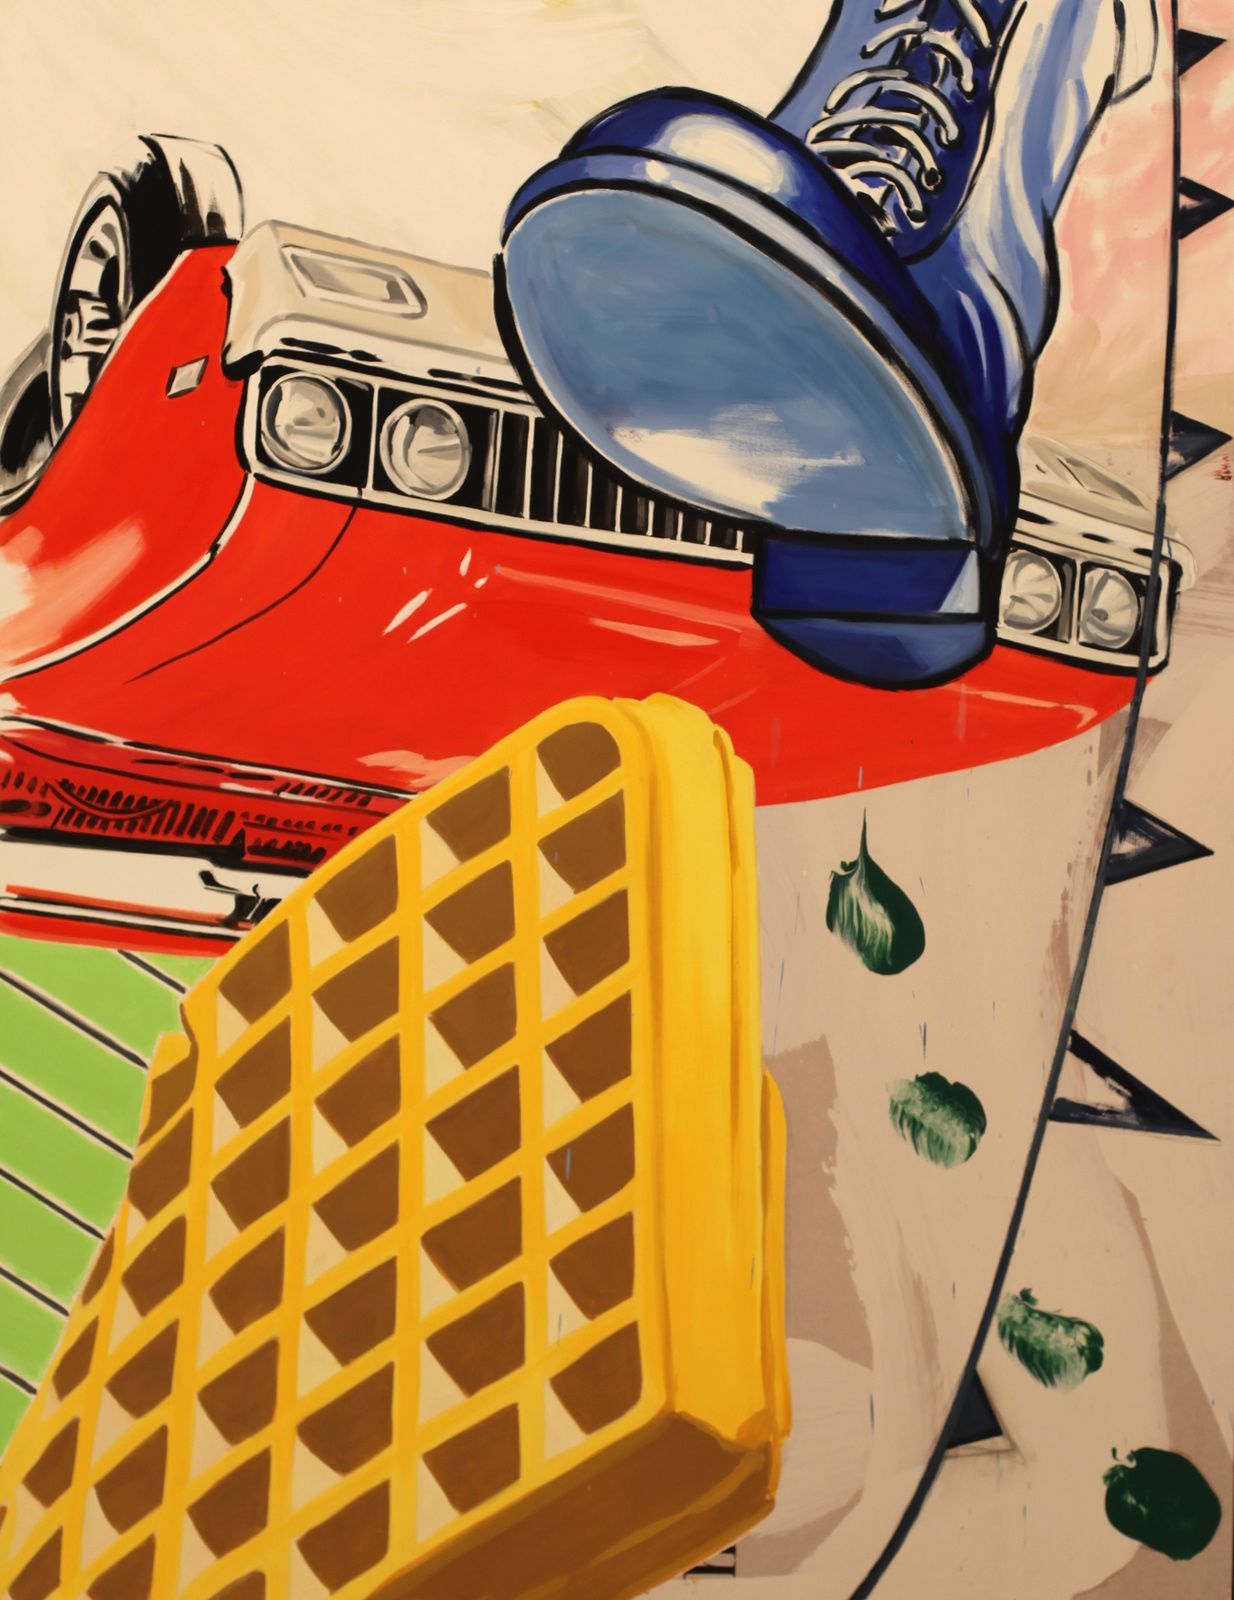 """Big Boot"", 2016 de David SALLE - Courtesy Galerie ROPAC Paris © Photo Éric Simon"